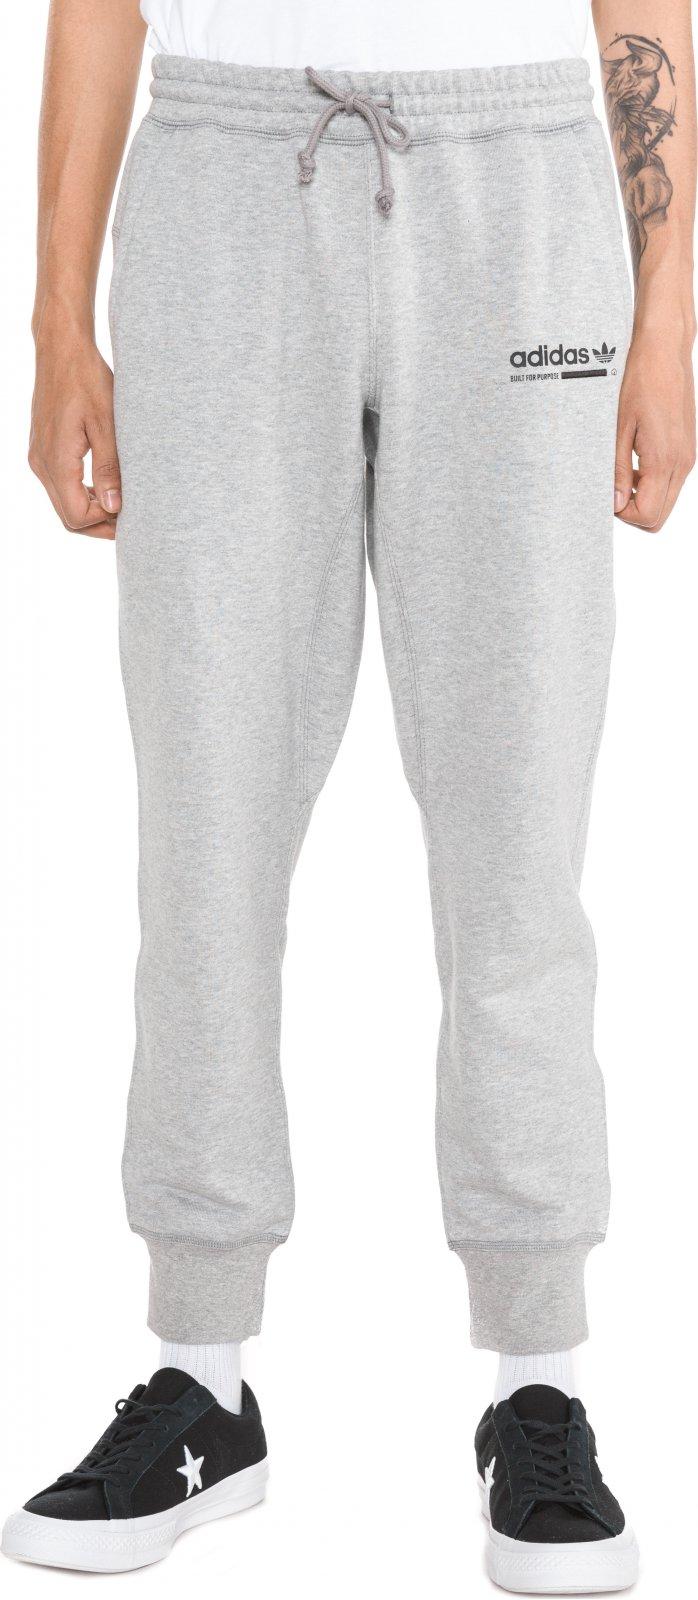 6440298fcb5 Adidas Kaval Sweat Pants Medium šedé od 1 499 Kč • Zboží.cz